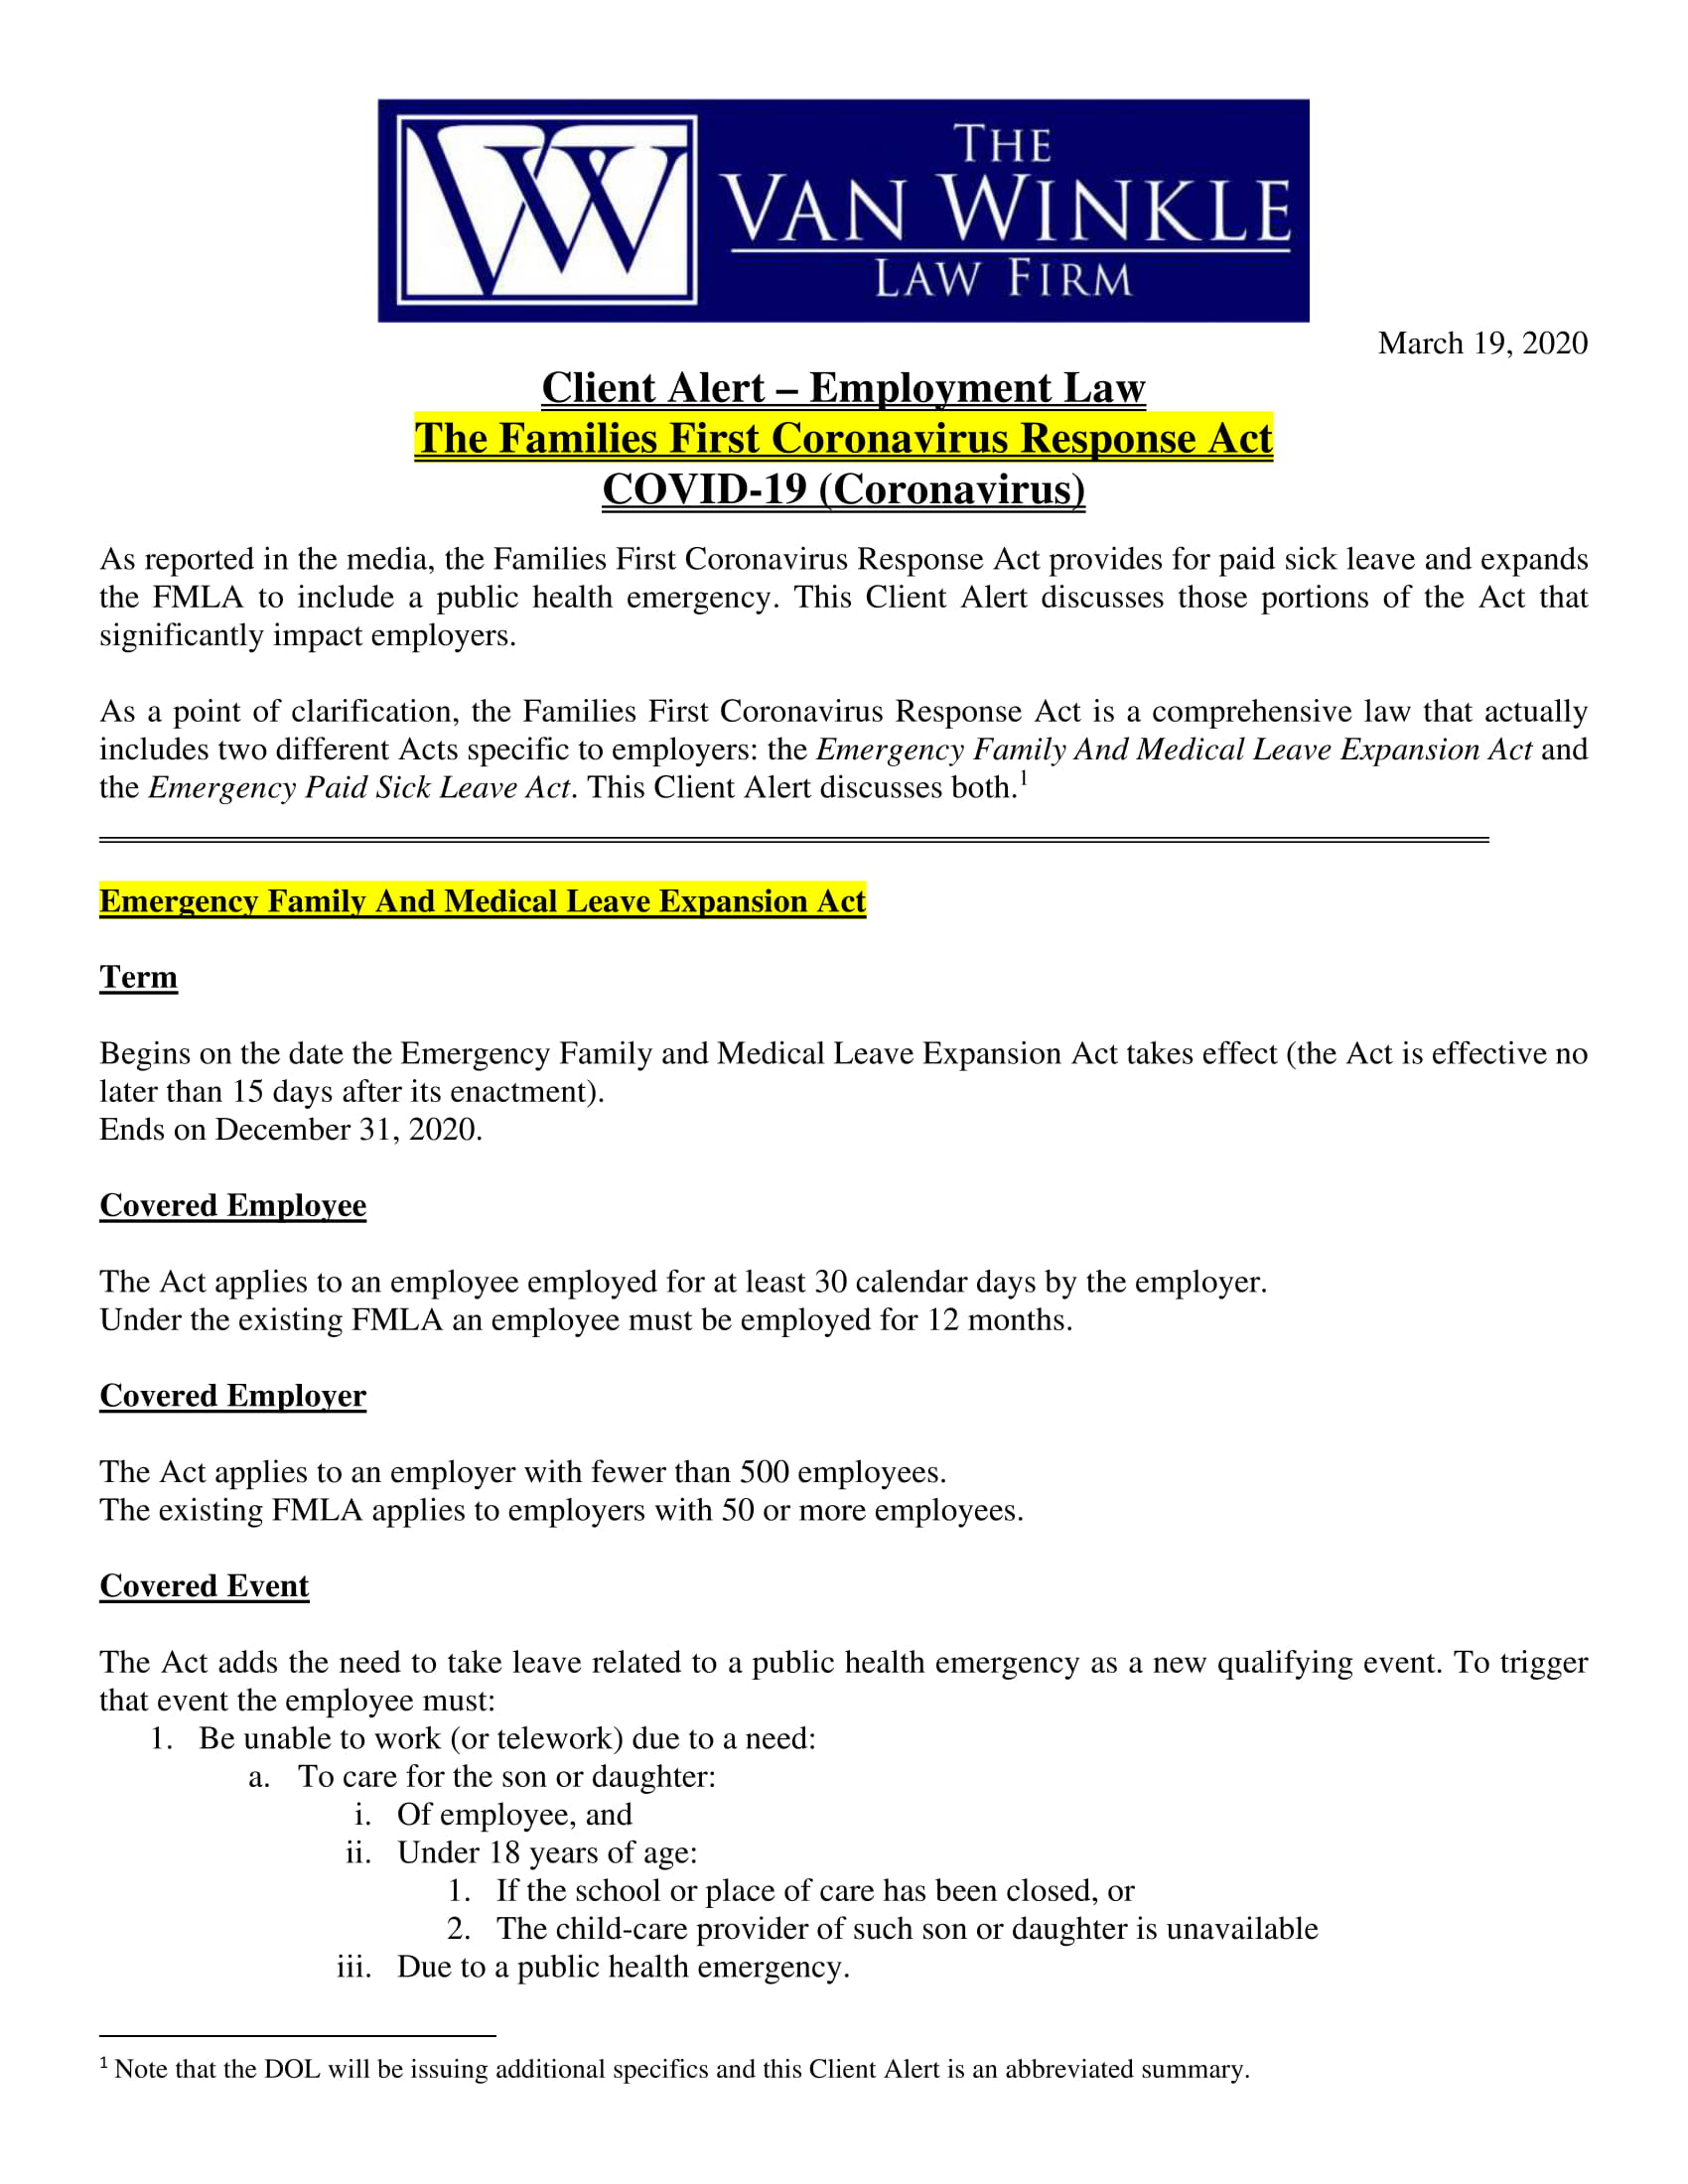 Families First Coronavirus Response Act Page 1